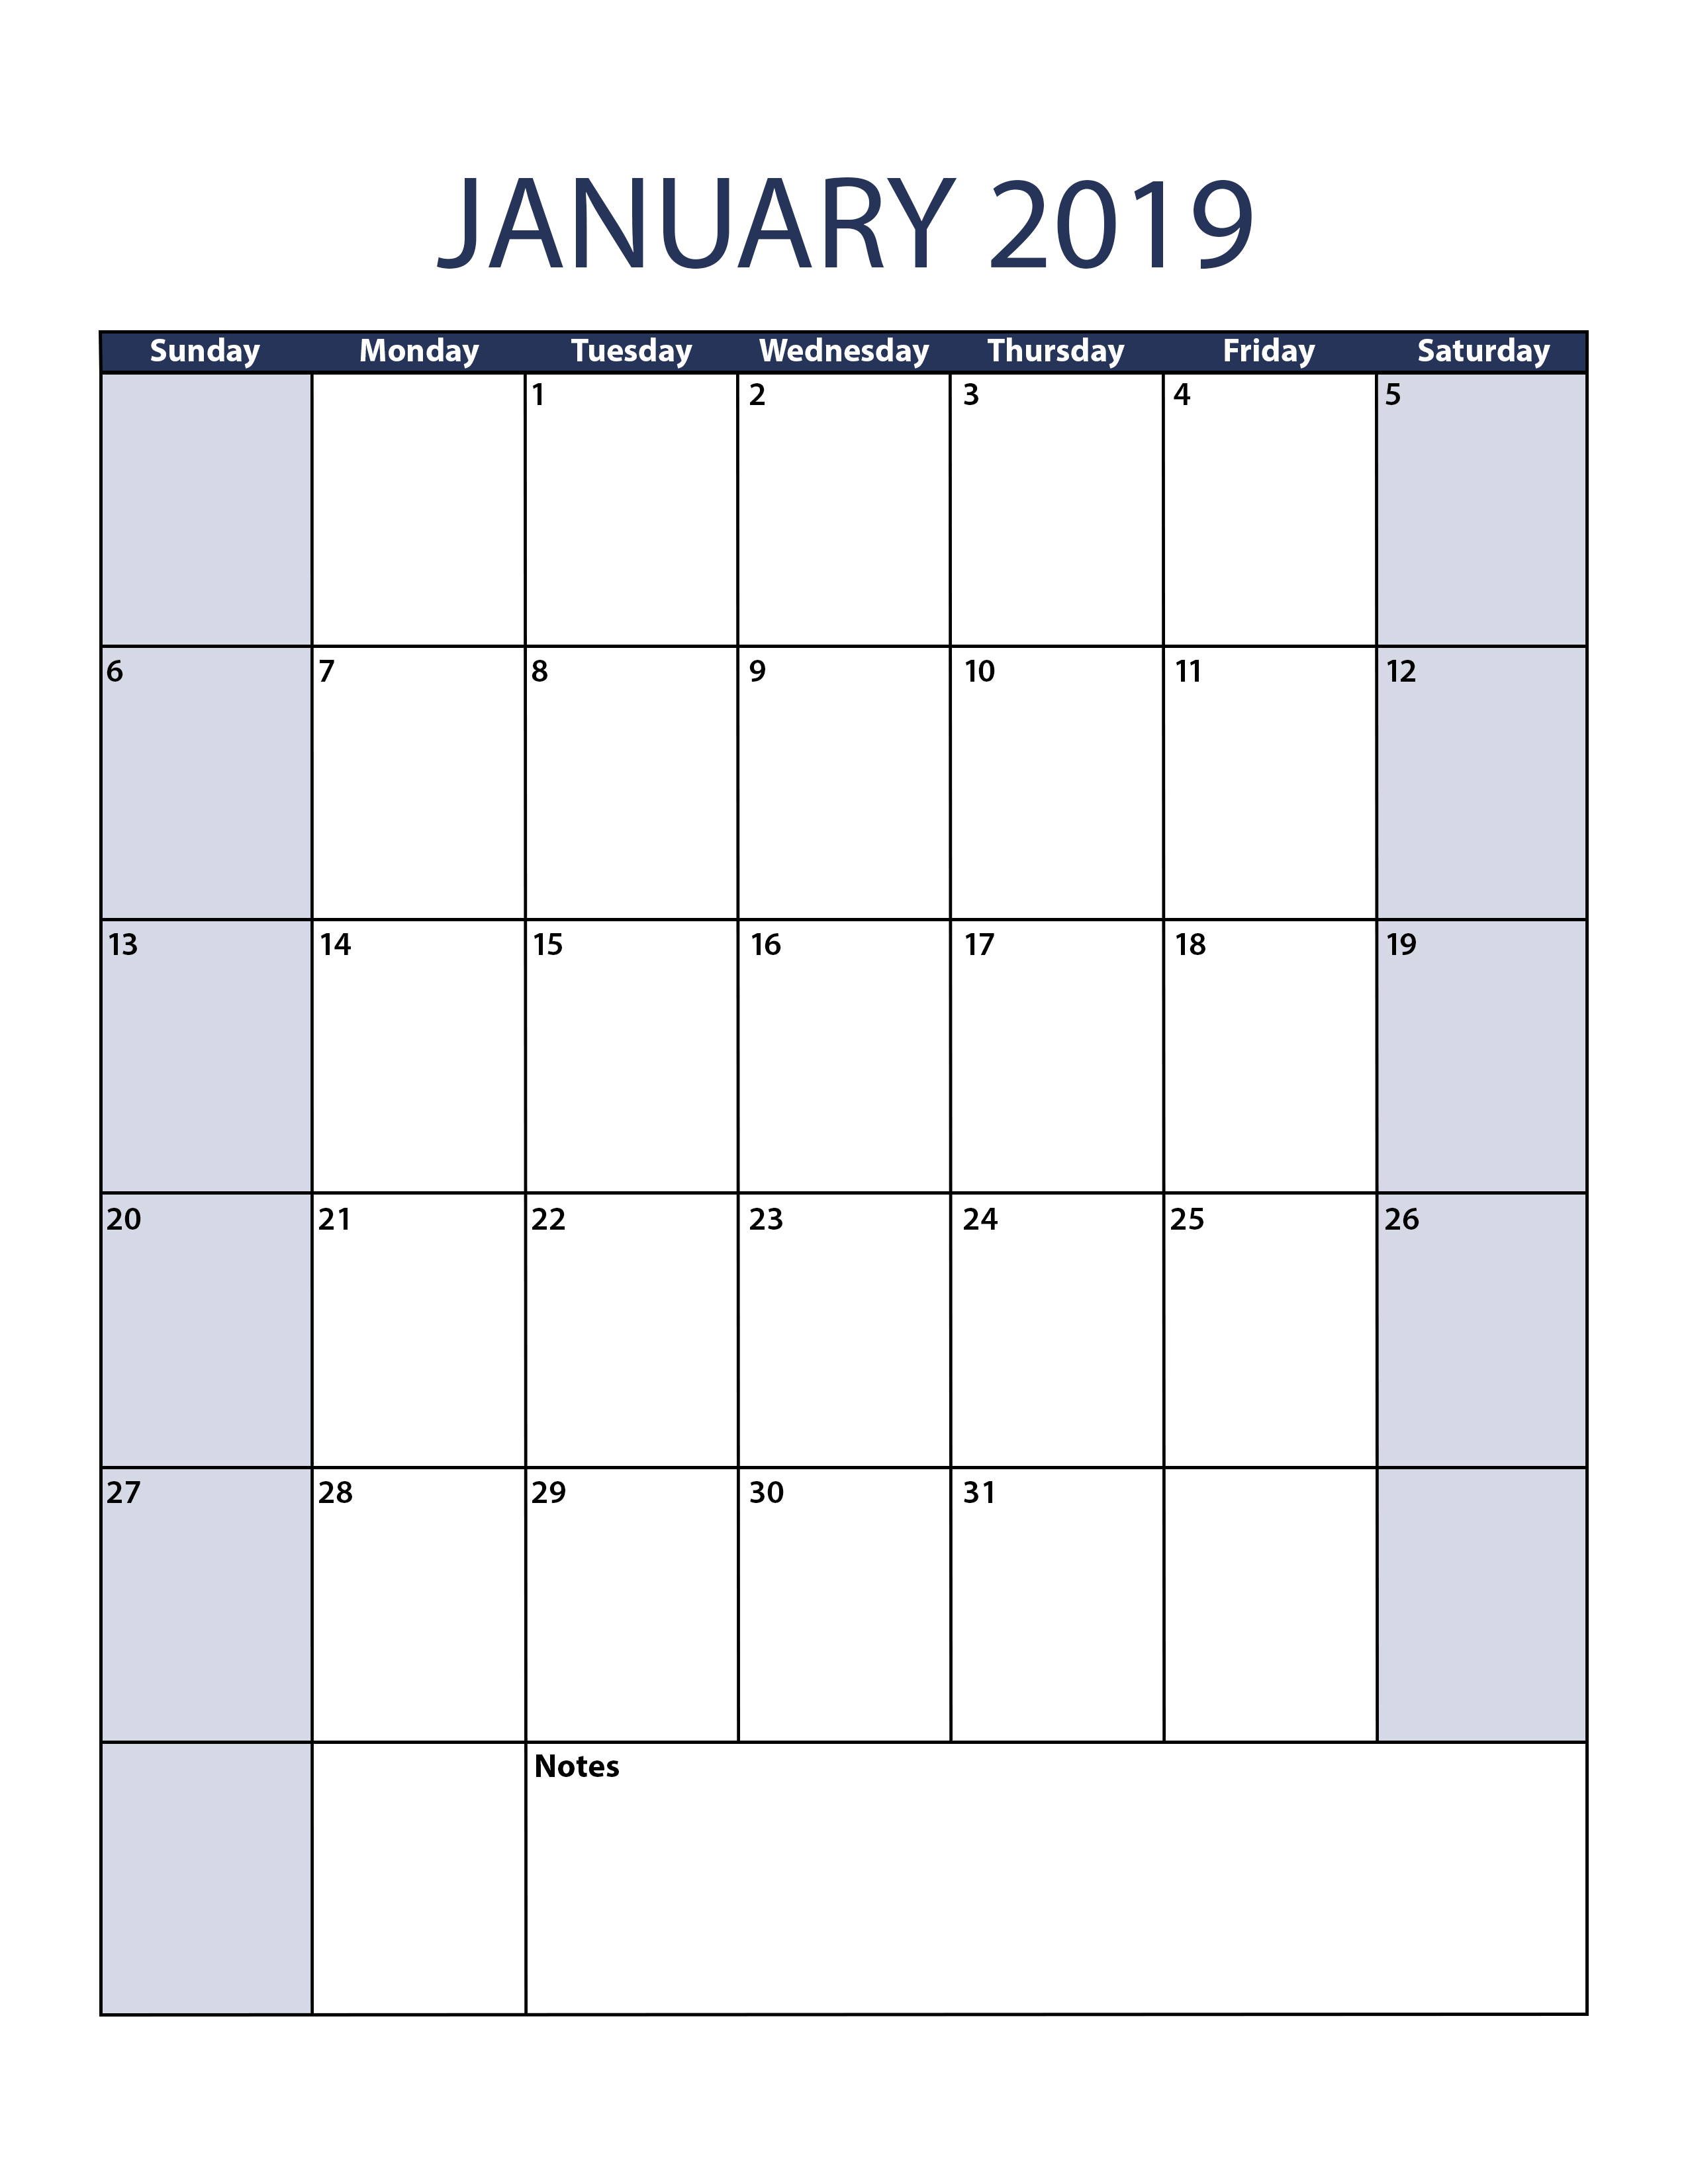 Blank January 2019 Calendar Planner